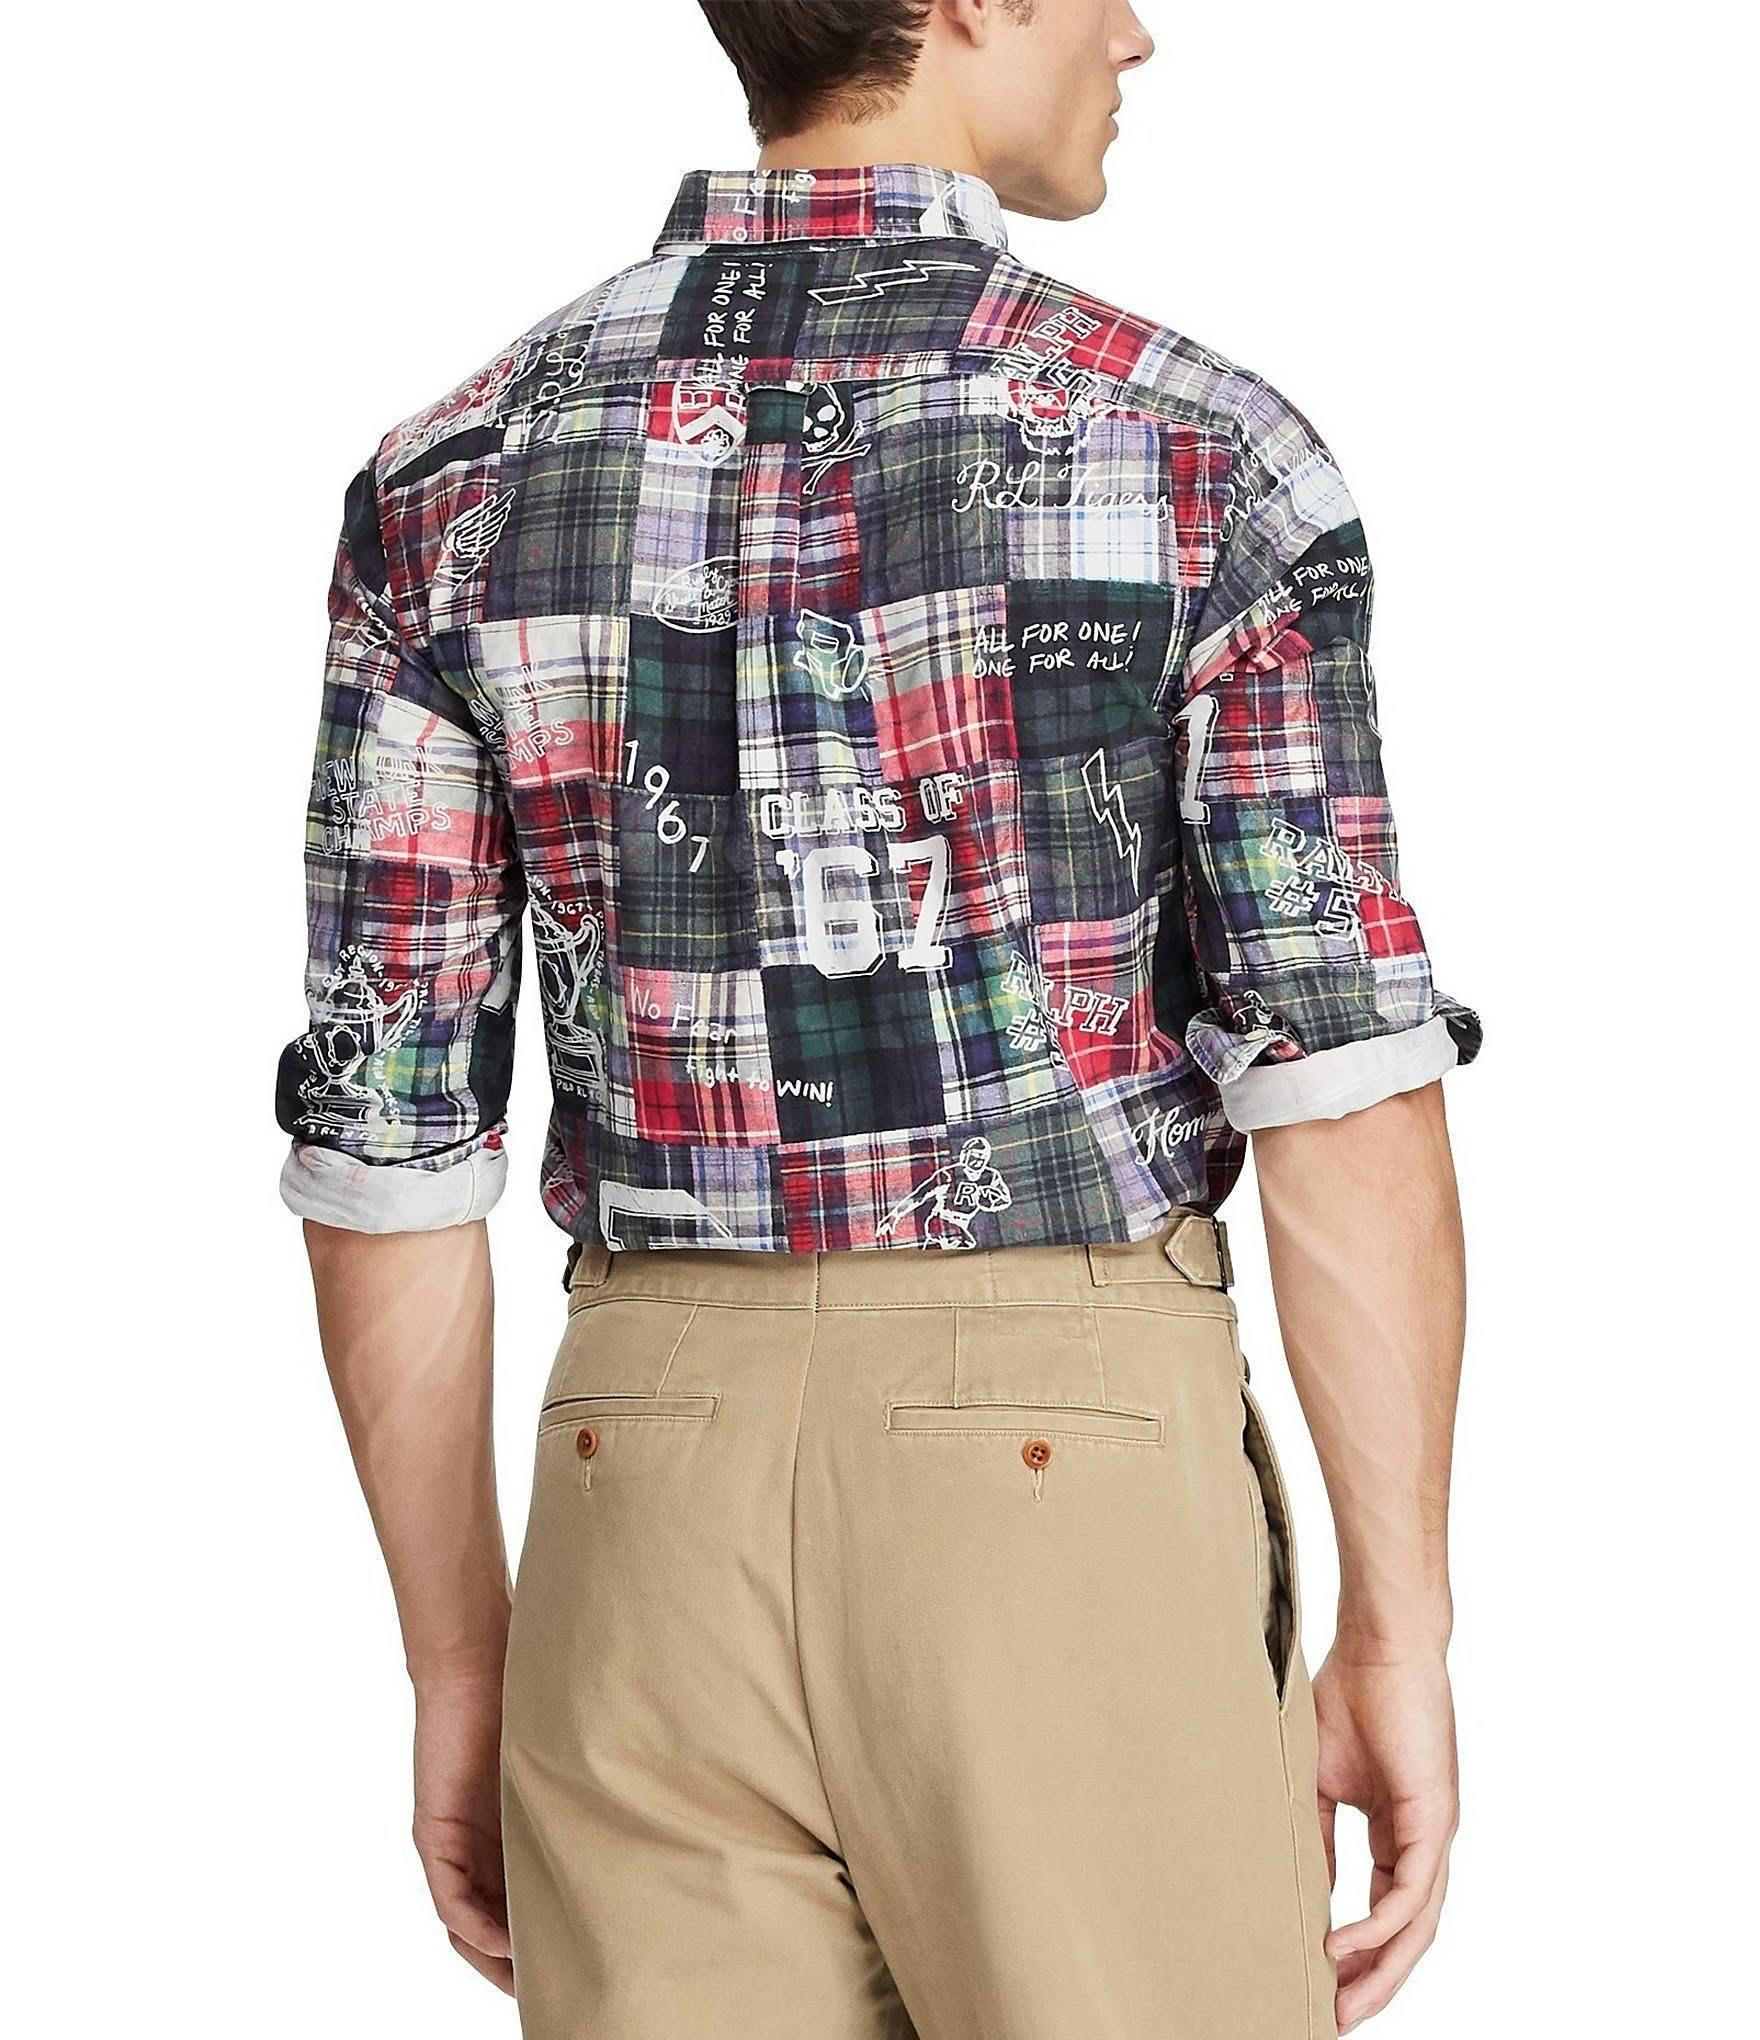 Remiendo 2xl Para Clásico Polo De Camisa Hombres Ralph Corte Lauren Sketchbook 0qwvIZ